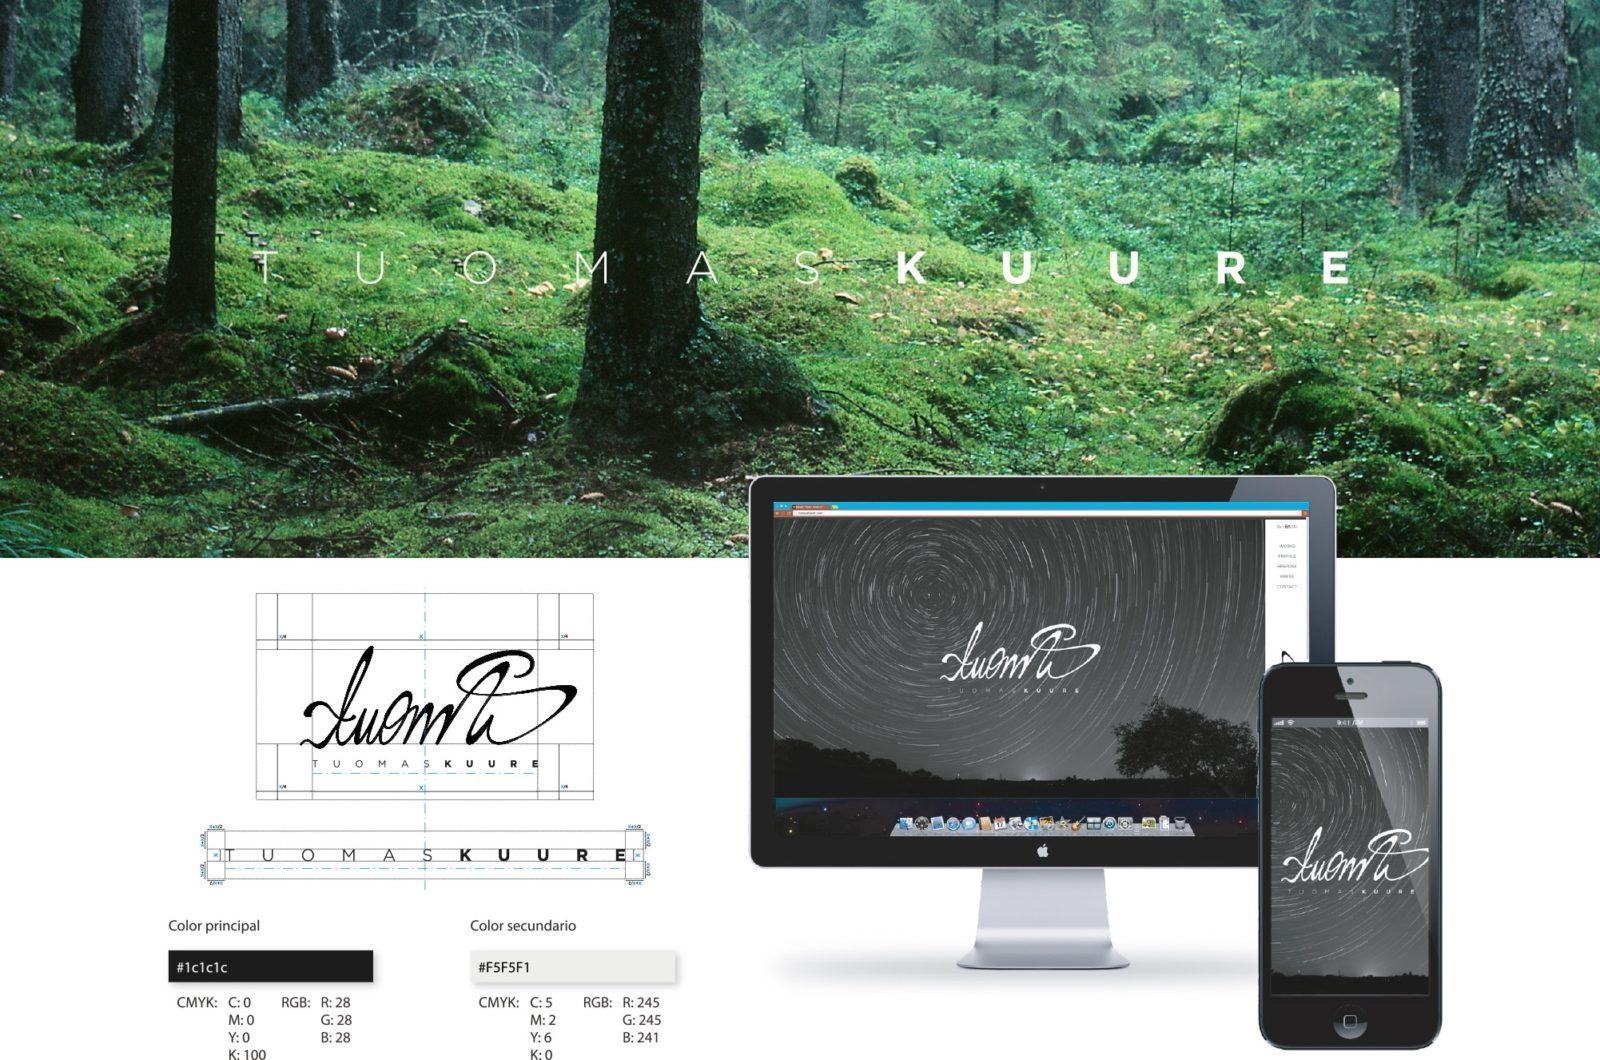 Sirope-tuomas-kuure-prueba-estudio-agencia-creativa-branding